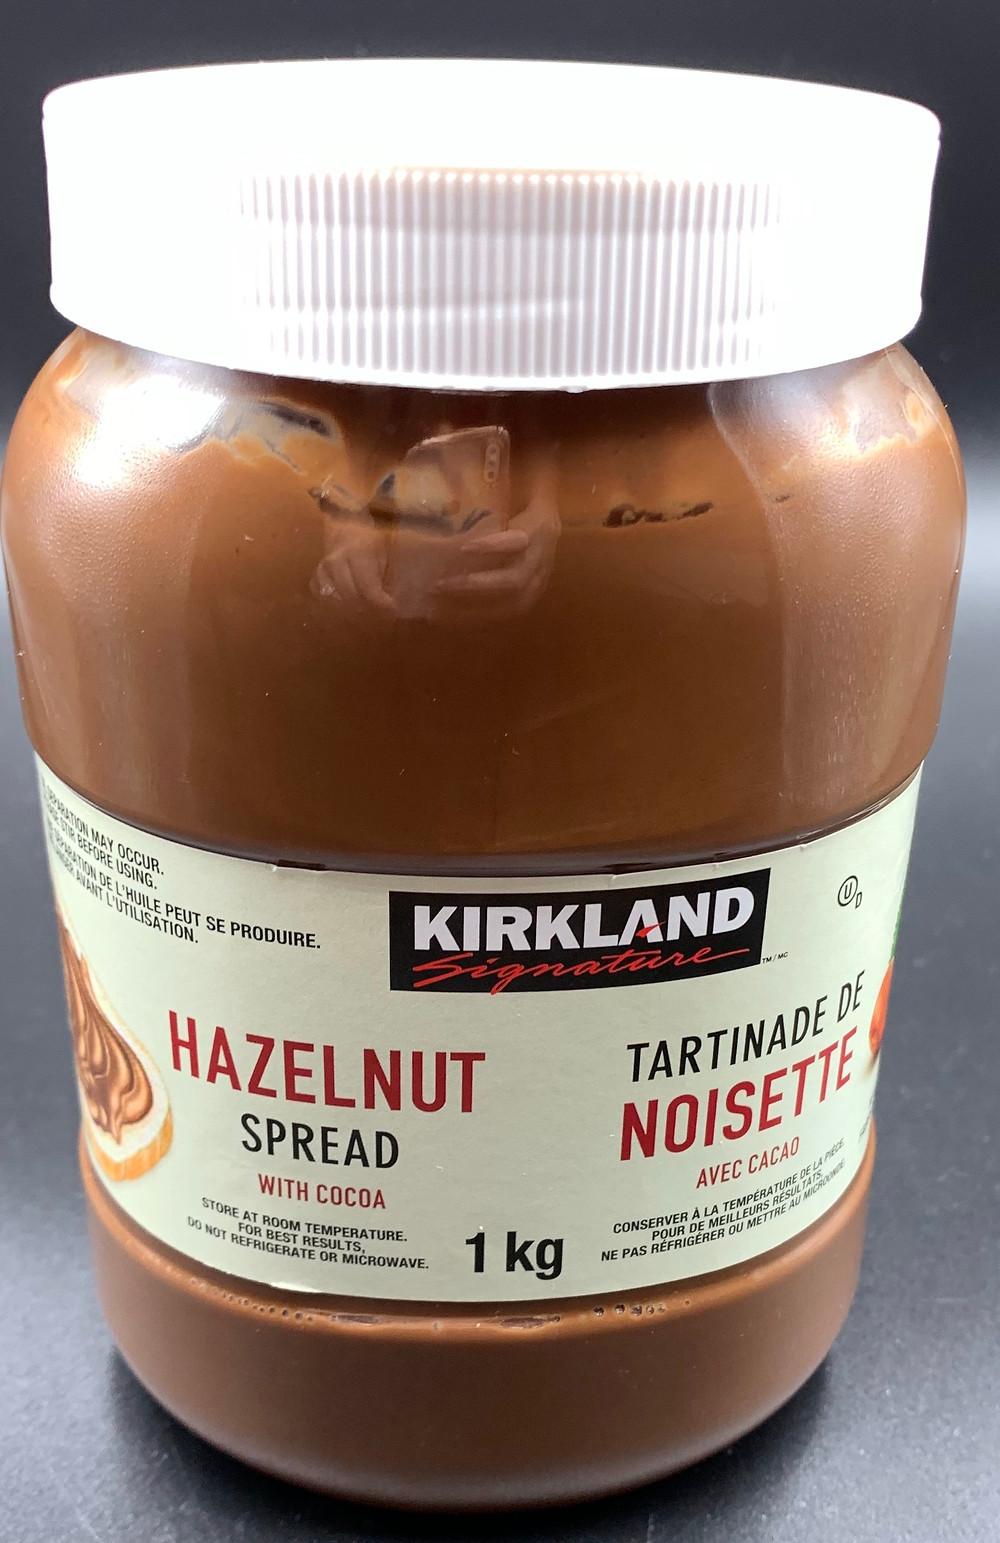 Costco Kirkland Signature Hazelnut Spread